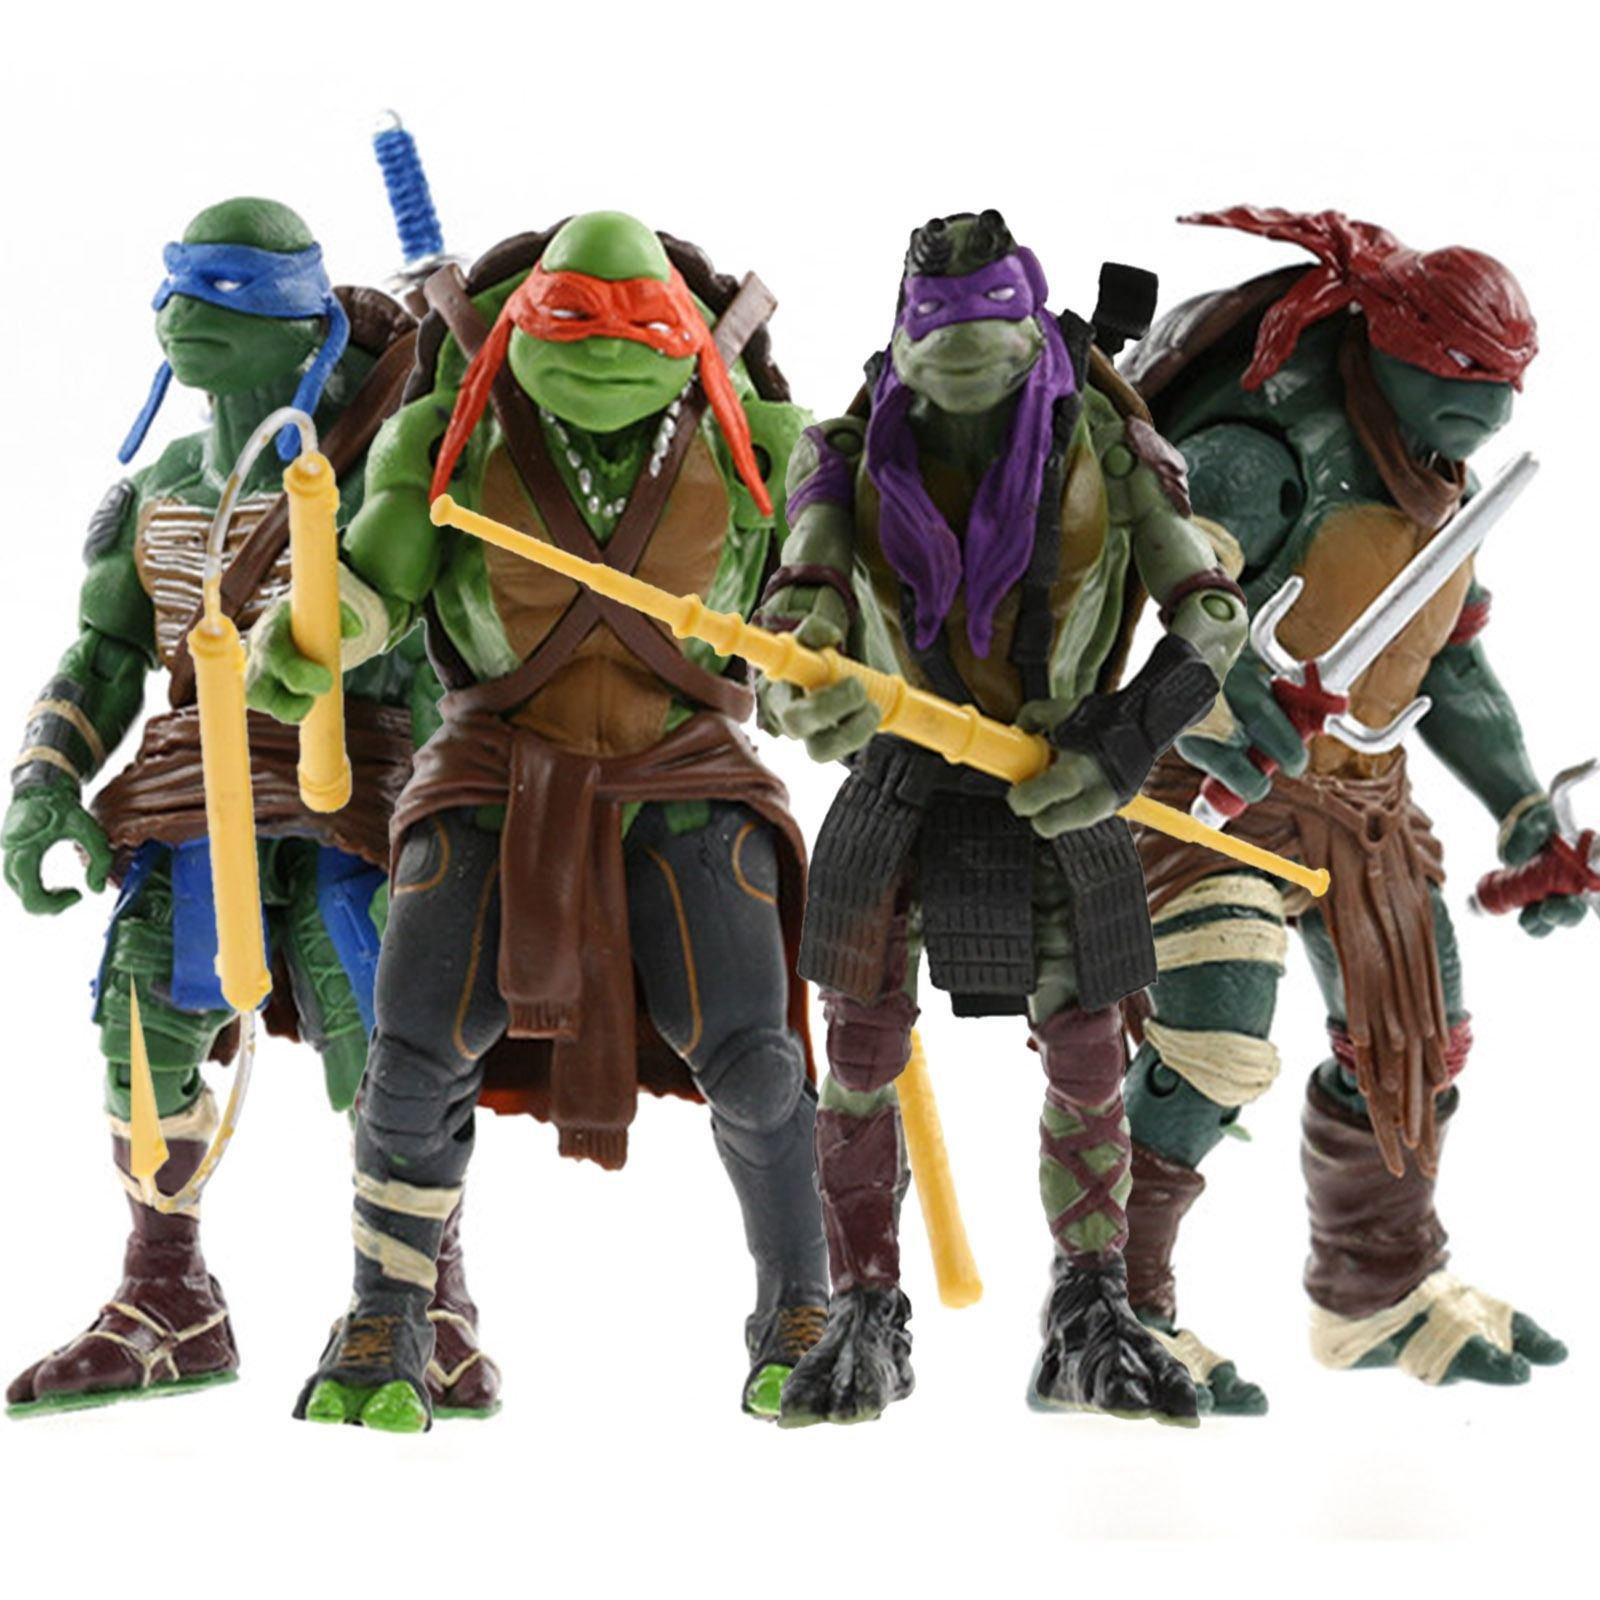 FiraDesign 2014 Hot 4pcs/Lot Teenage Mutant 5'' Action Figure TMN Turtle Toys